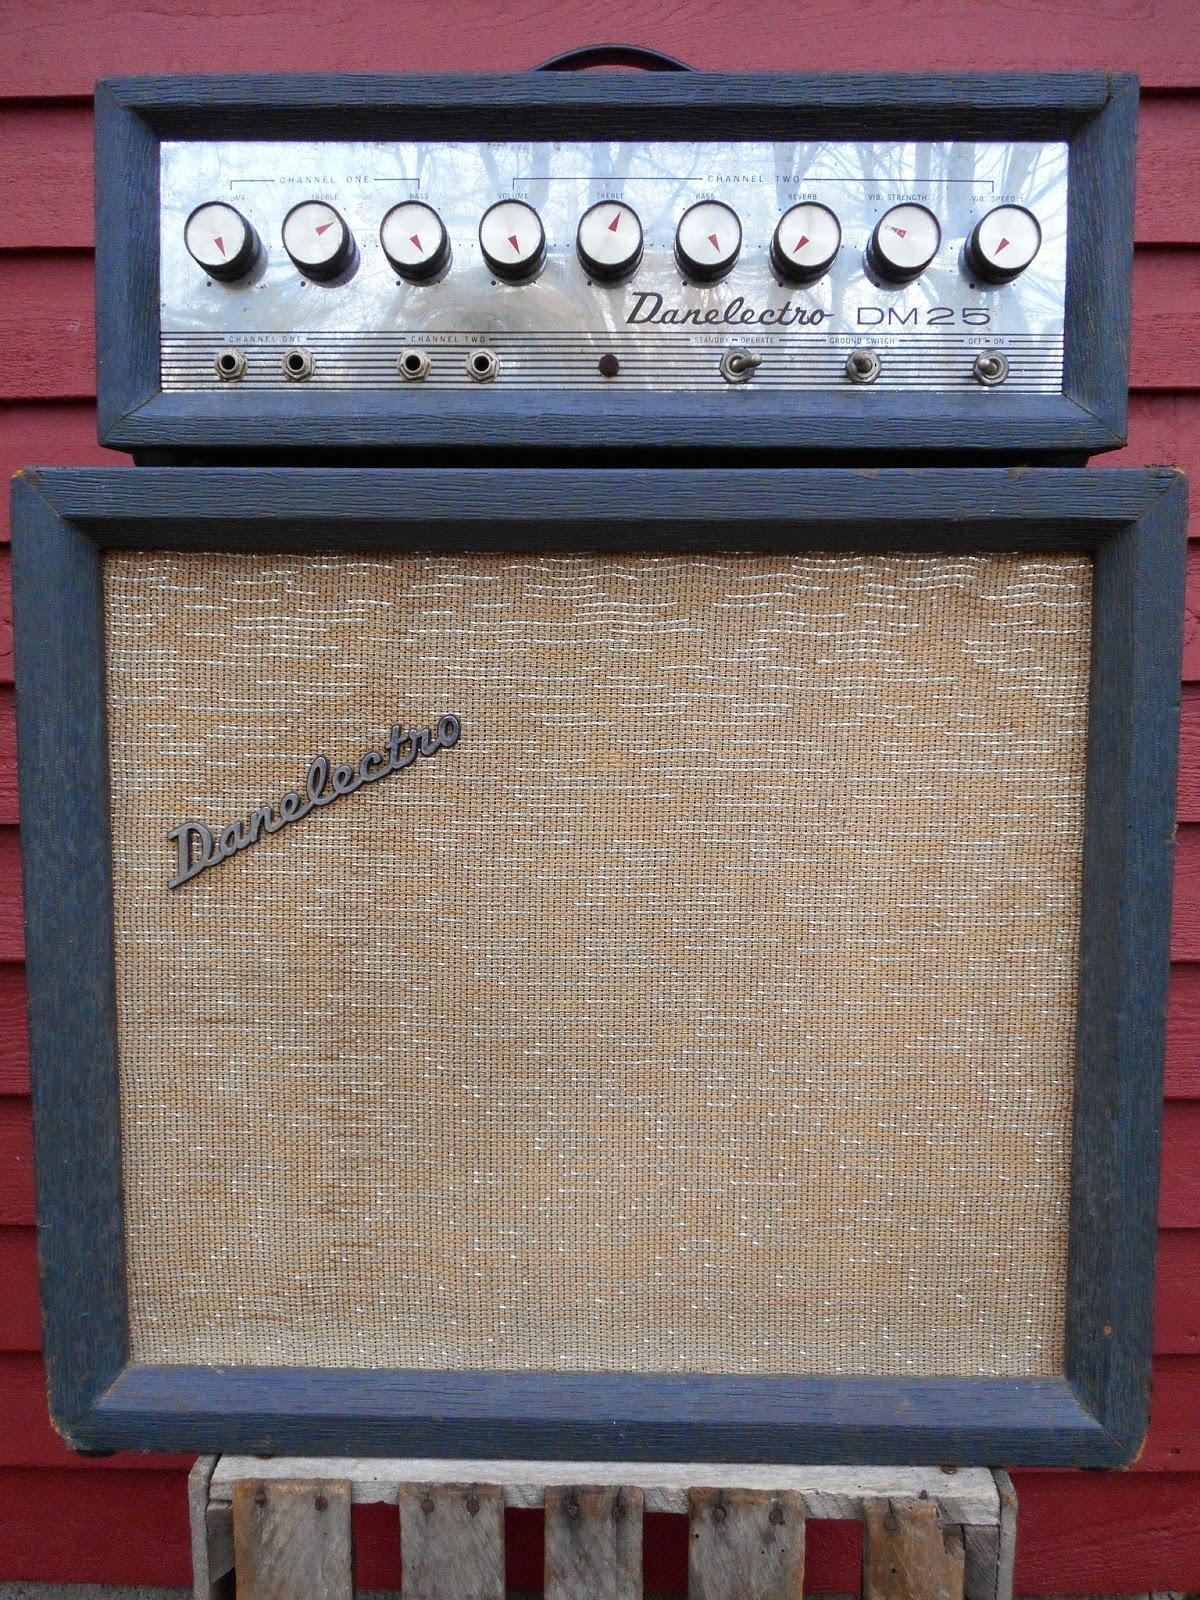 Dating a danelectro dm25 guitar amp